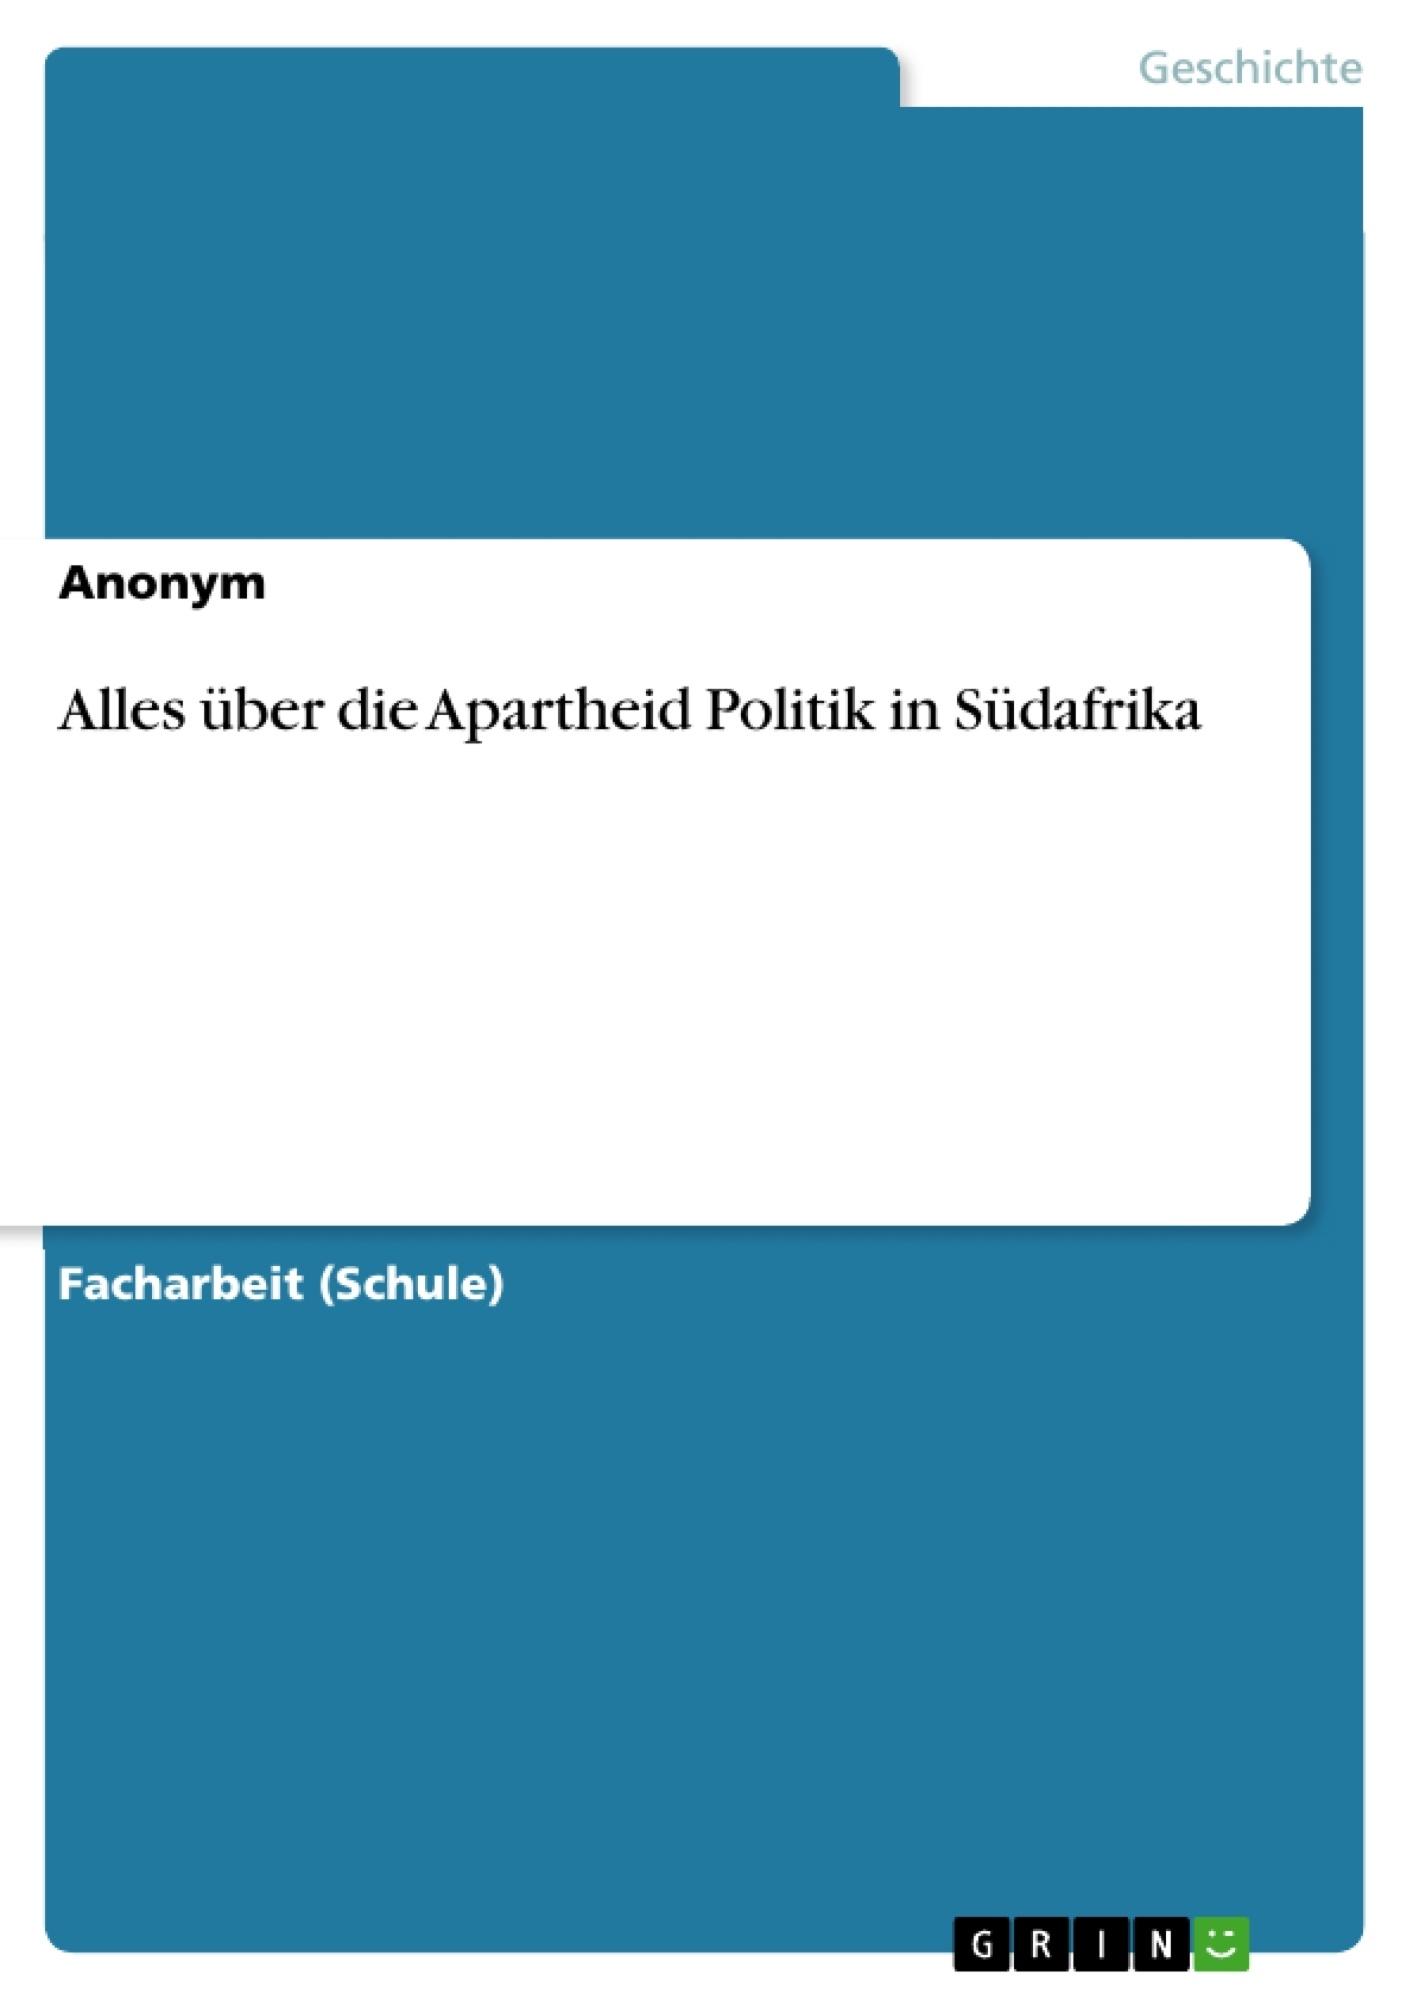 Titel: Alles über die Apartheid Politik in Südafrika